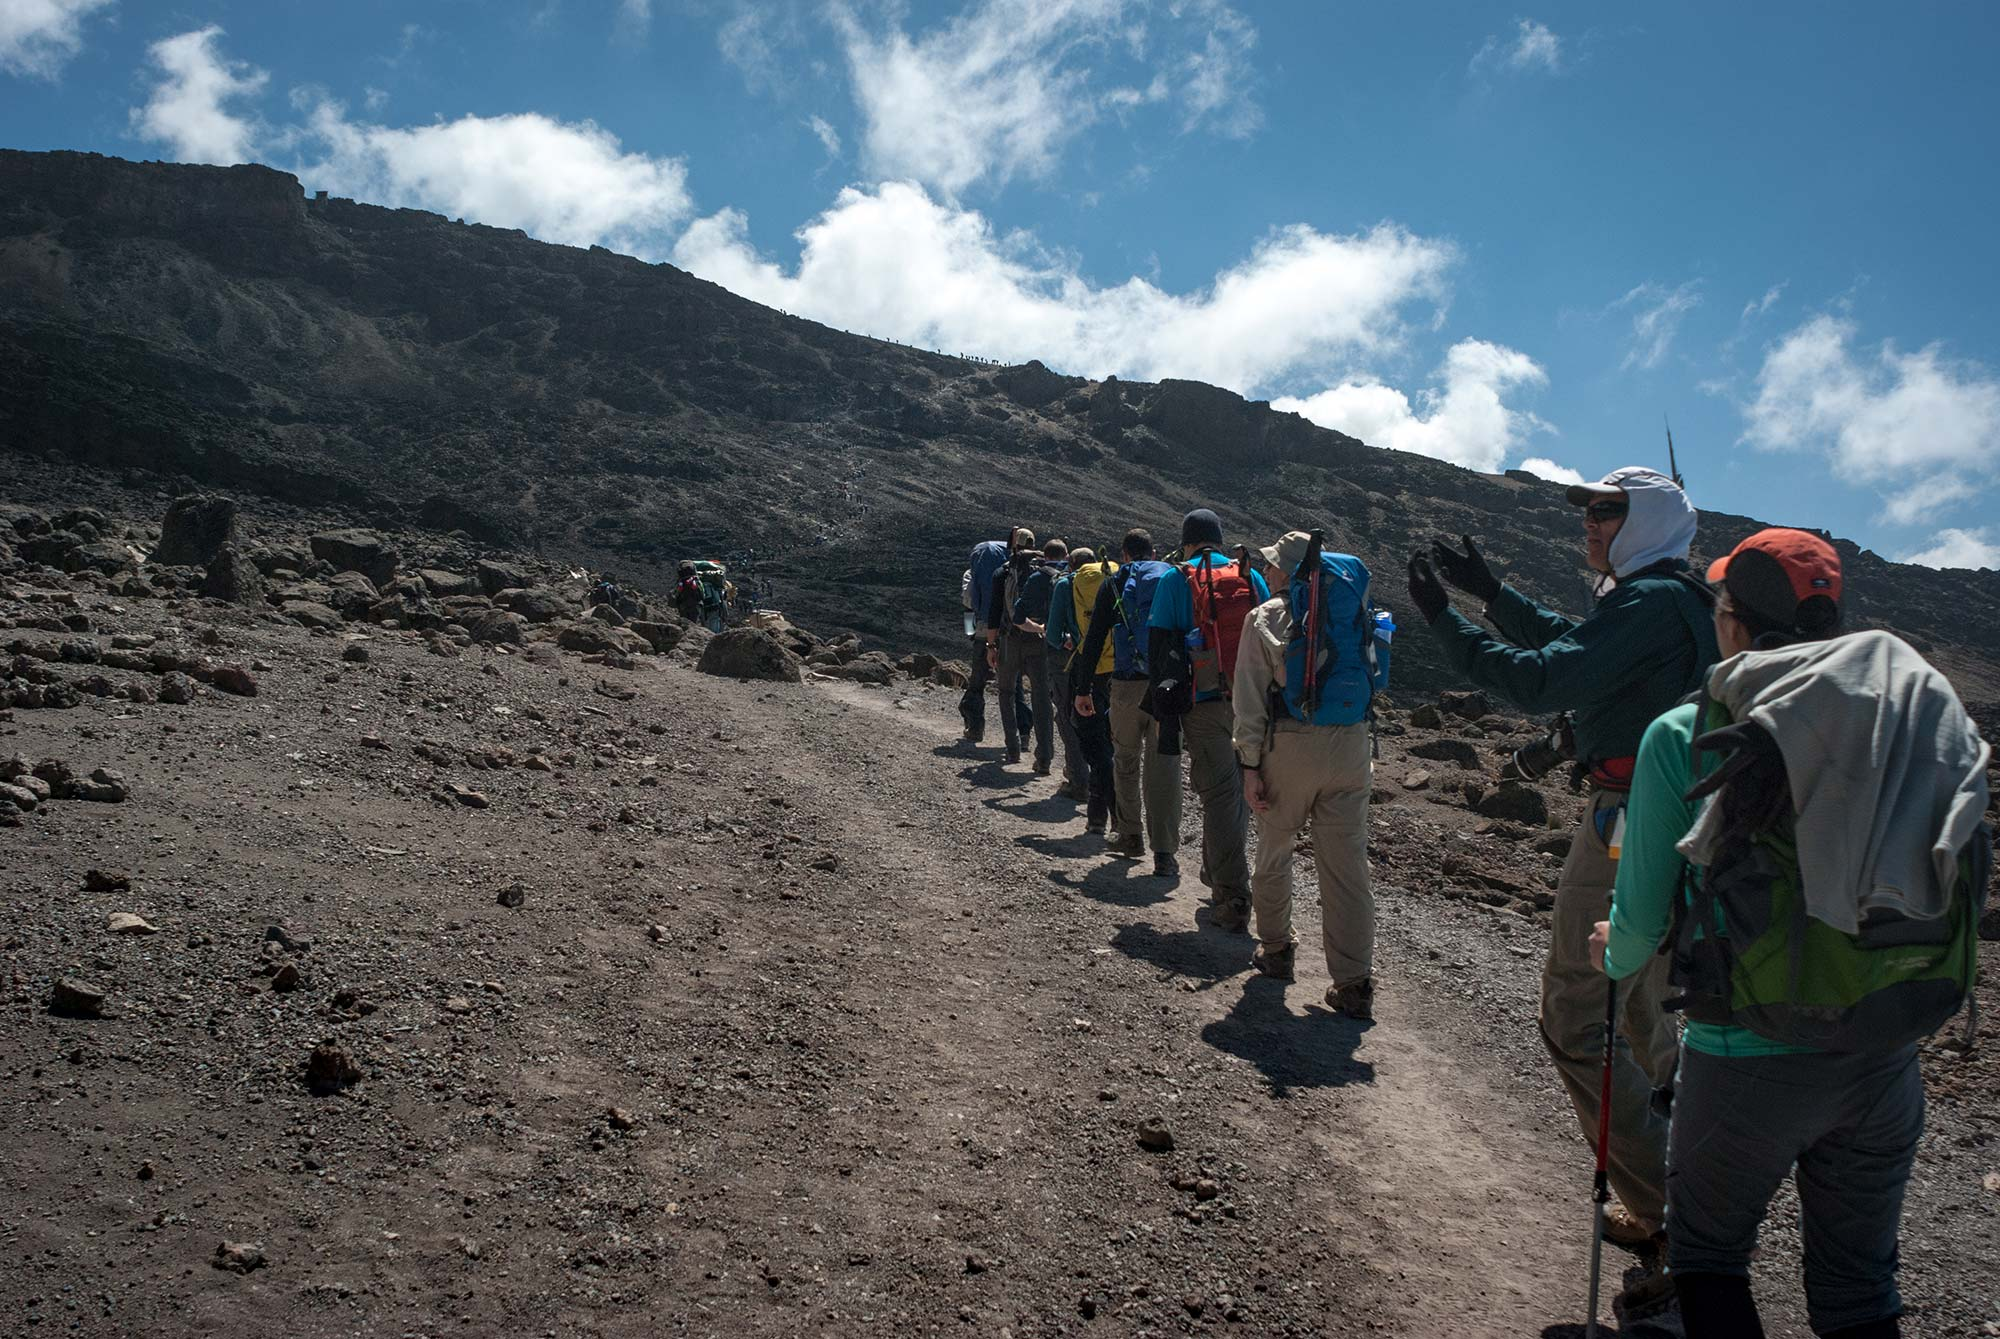 D6-32-dots-on-the-horizon-karanga-camp-to-barufu-camp-kilimanjaro.jpg